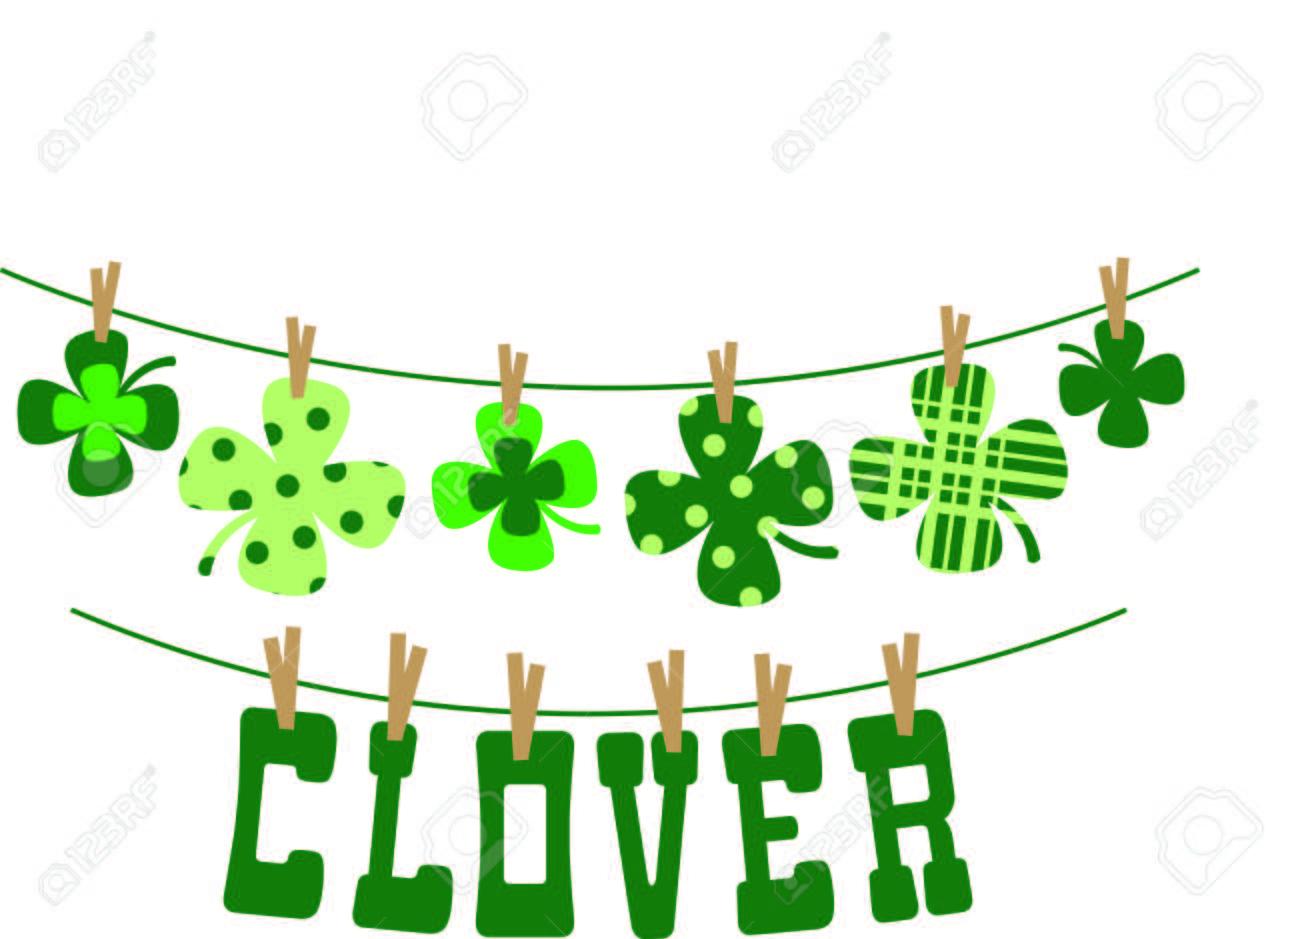 Enjoy St. Patricks Day With Your Irish Shamrock Clothesline.